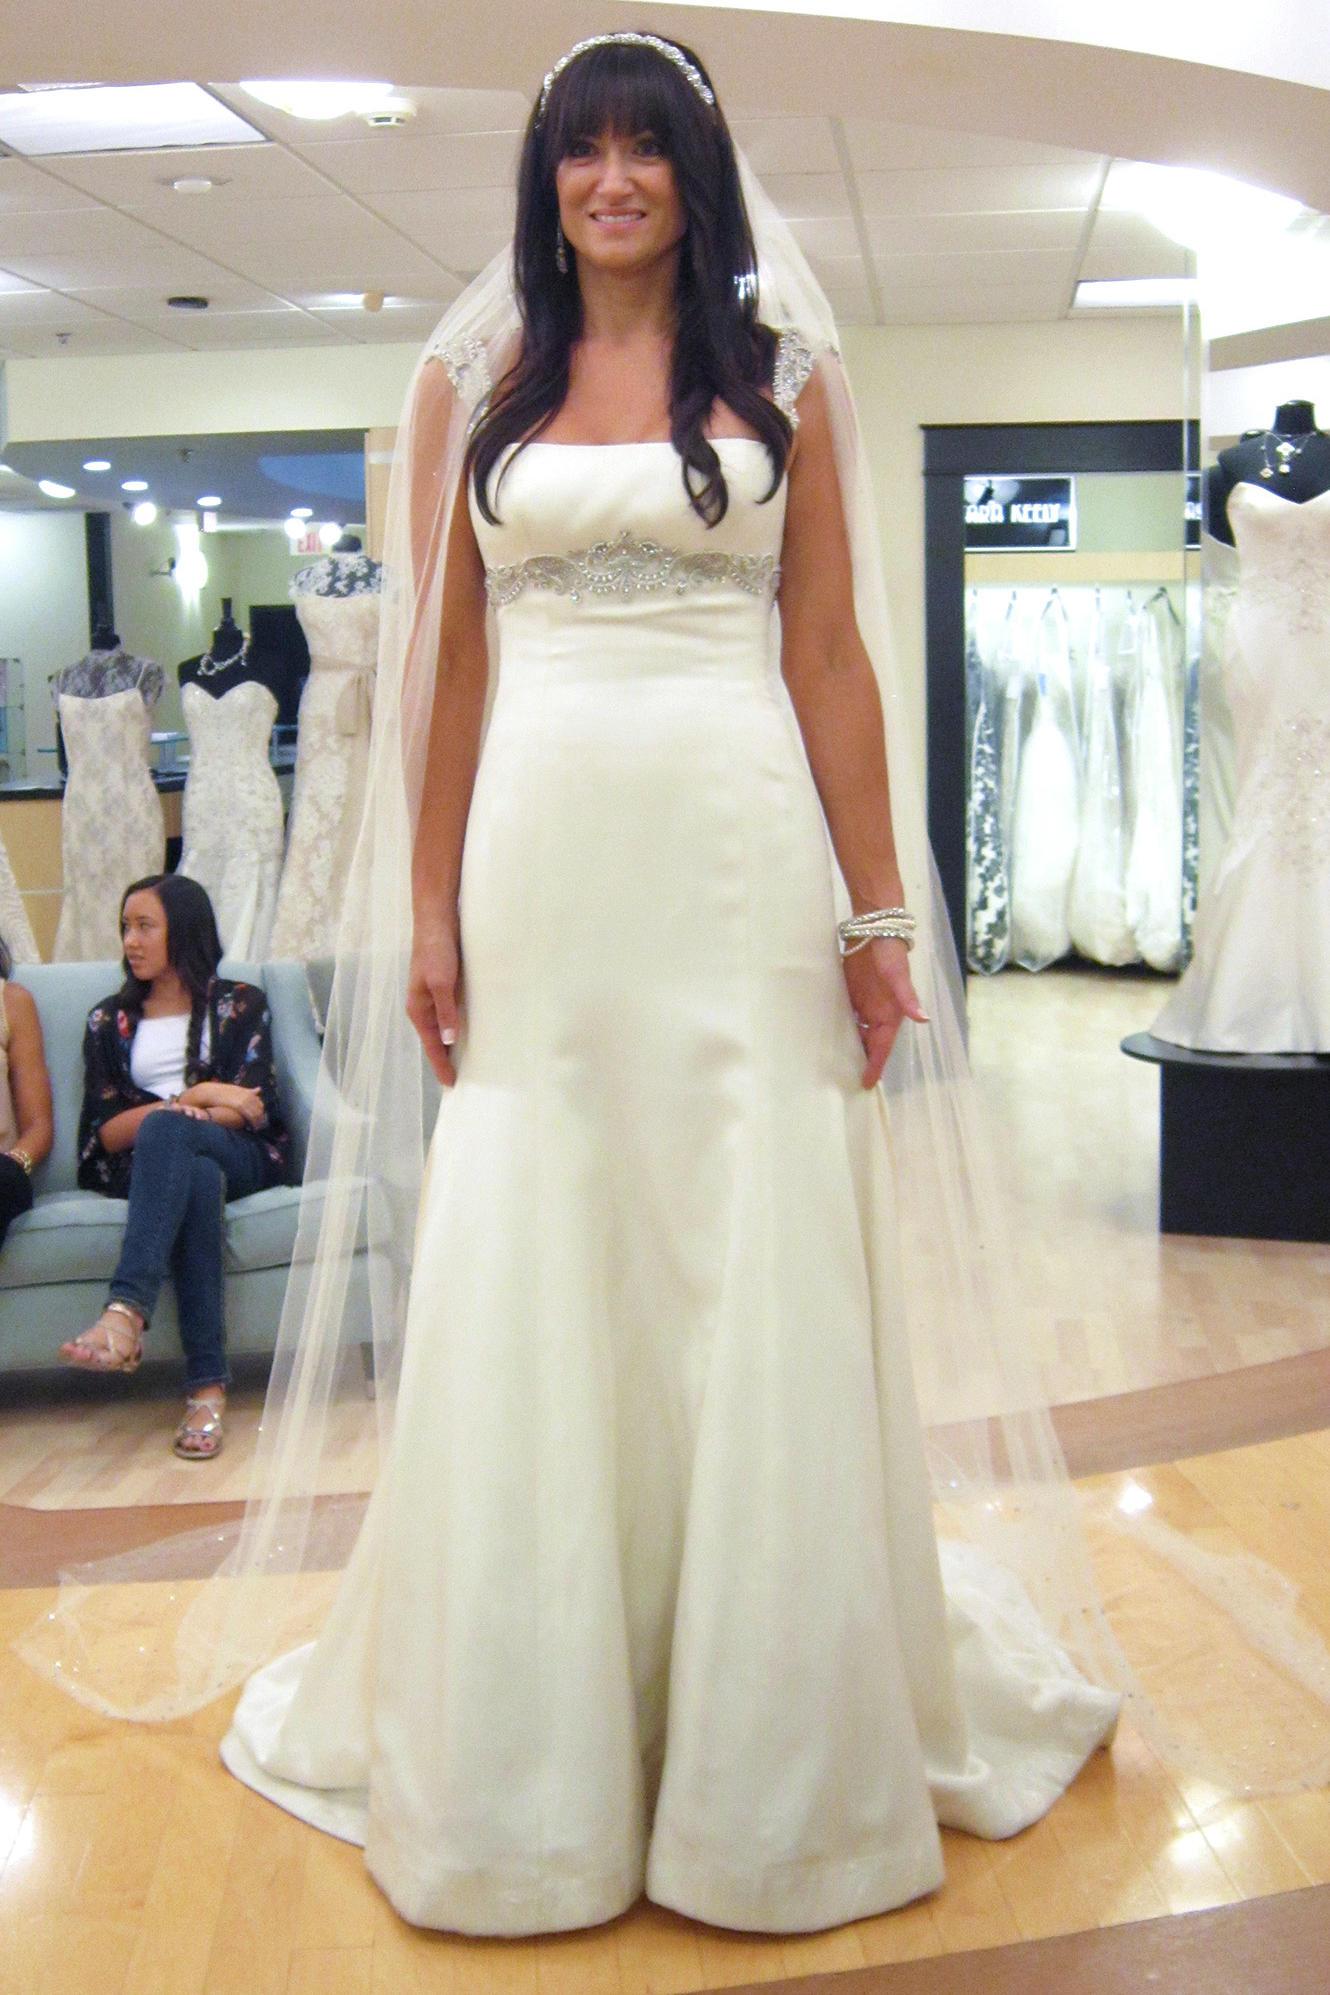 Lisa robertson in wedding dress - Say Yes To The Dress Atlanta